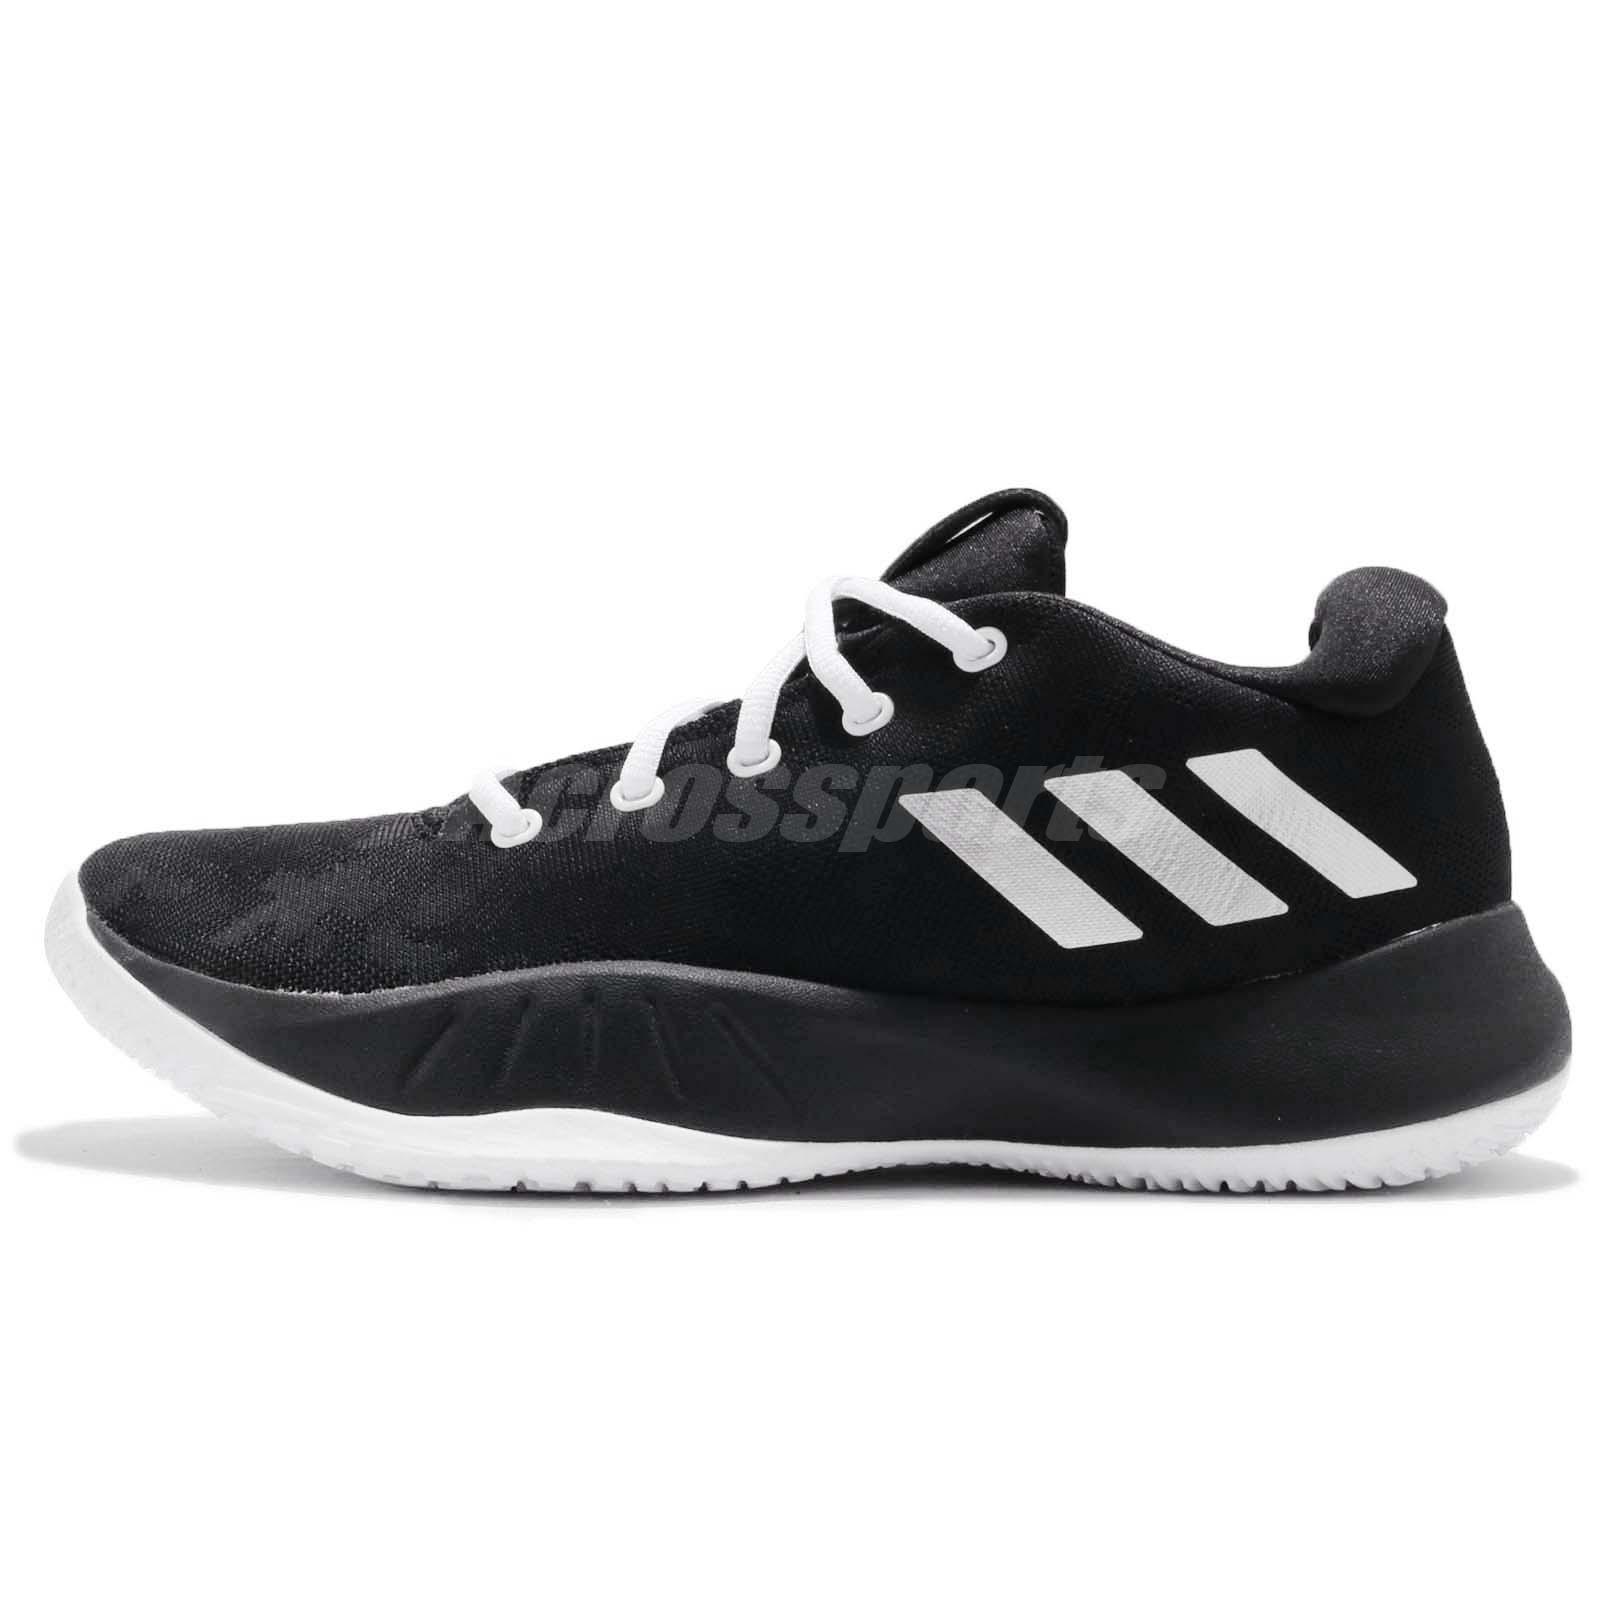 adidas NXT LVL SPD VI Next Level Speed 6 Black White Men Basketball Shoes  CQ0180 46de8dddb